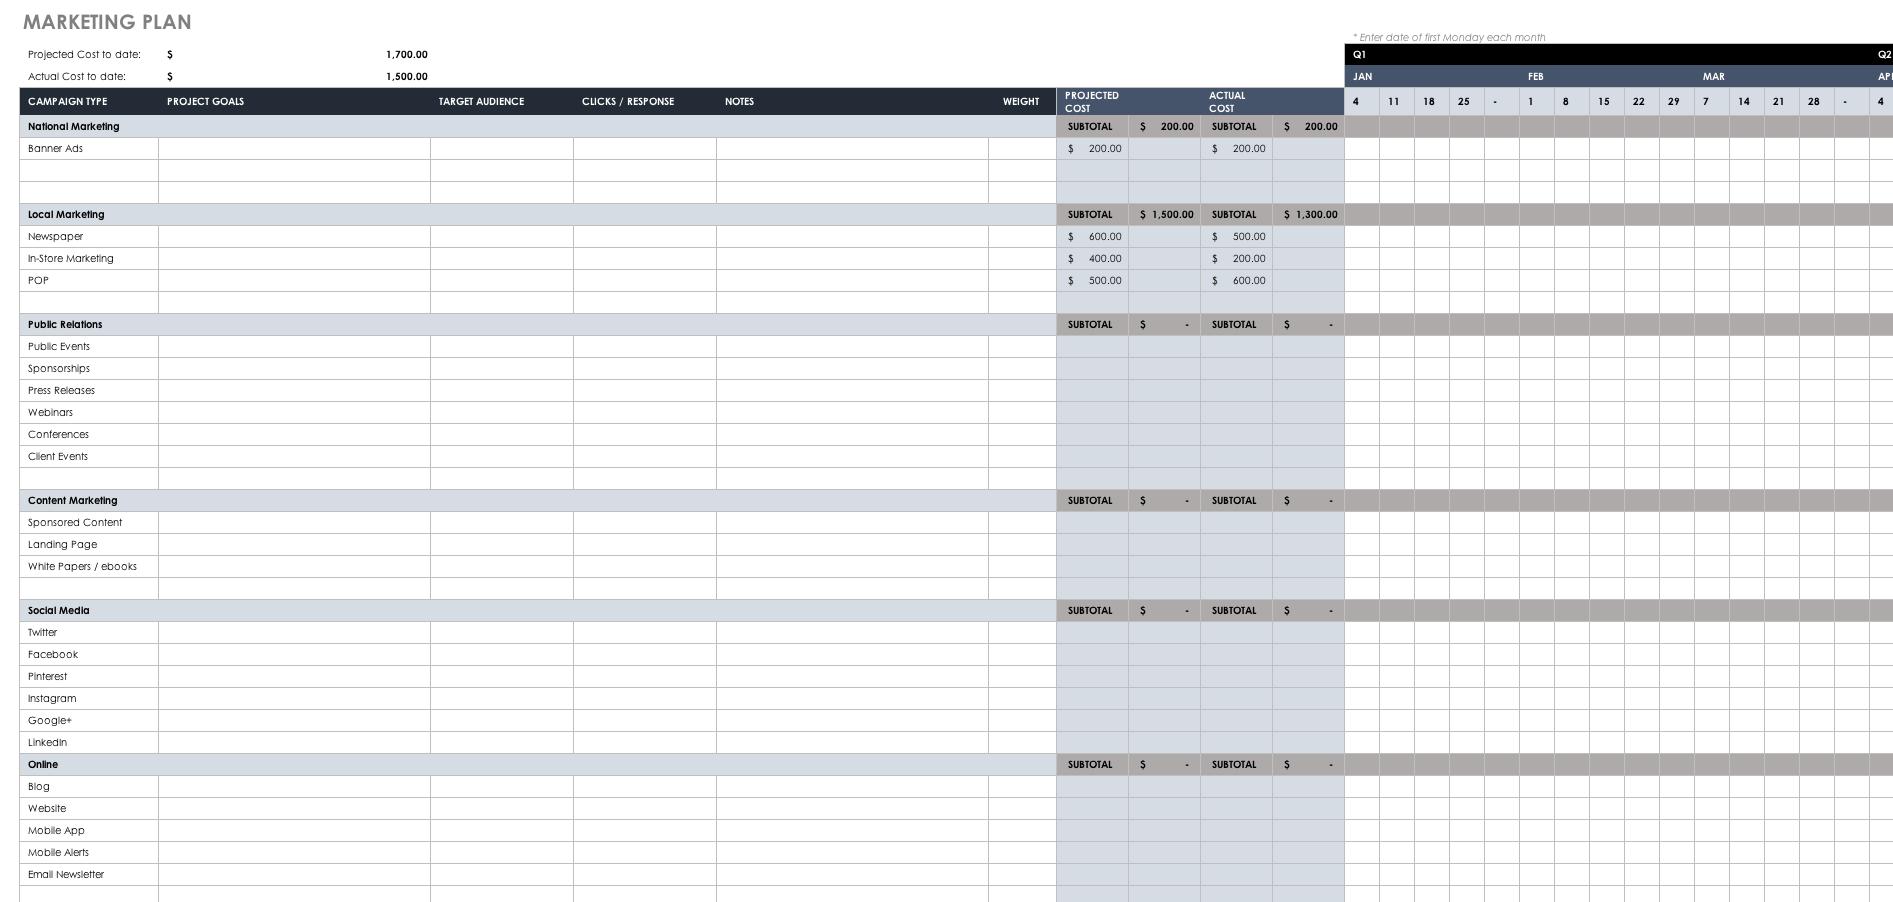 Letter Of Marketing Plan Timeline Template Excel And Marketing Plan Timeline Template Excel Xls